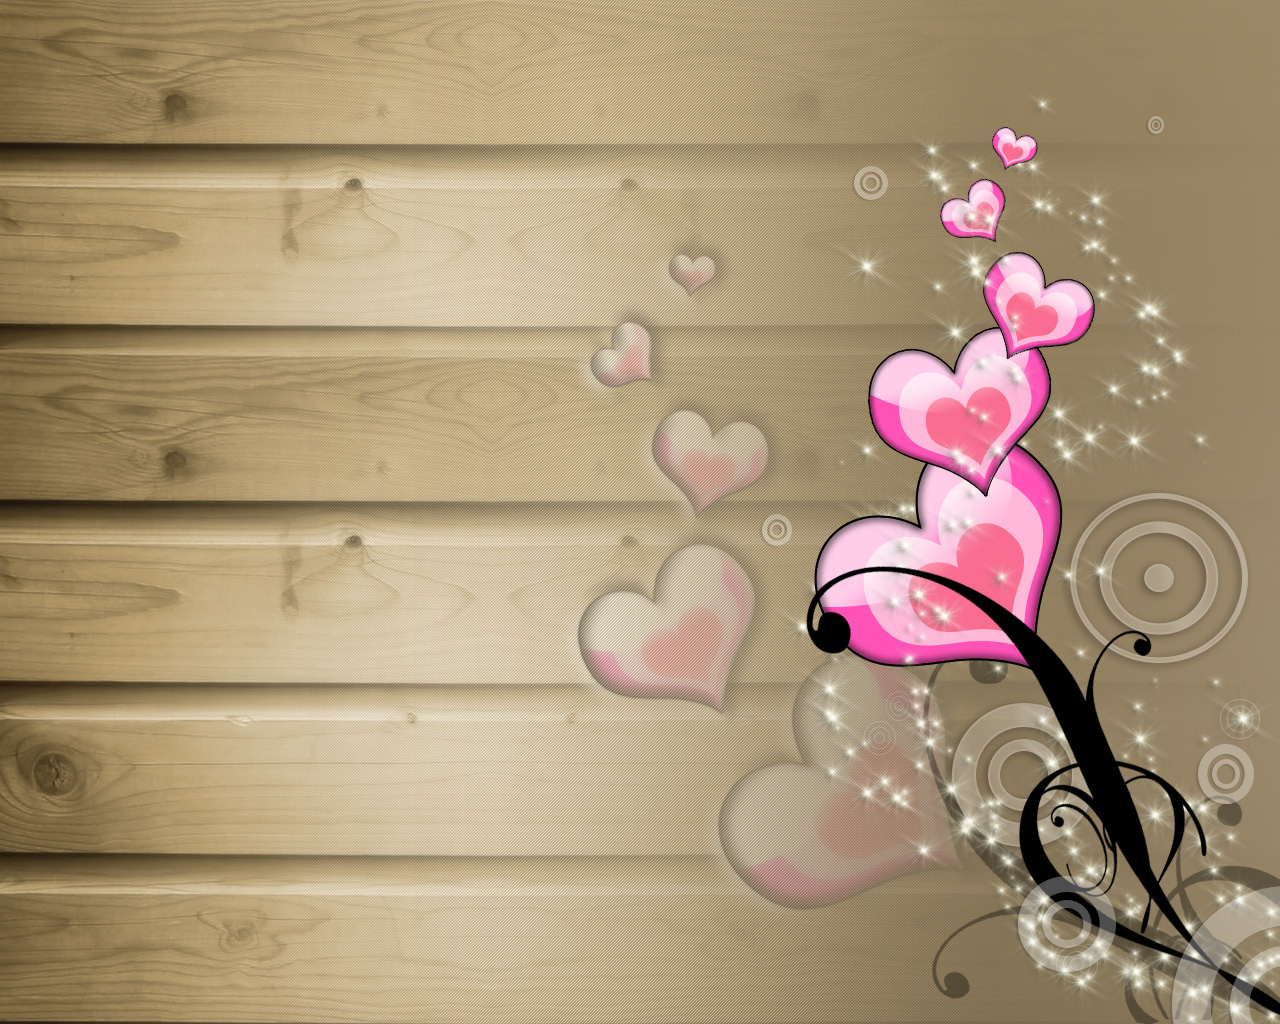 http://2.bp.blogspot.com/-dOrd6-AQotY/TzZjpOtV8RI/AAAAAAAADoc/F_OzYNY0EpA/s1600/gift-hearts-wallpapers_3059_1280.jpg